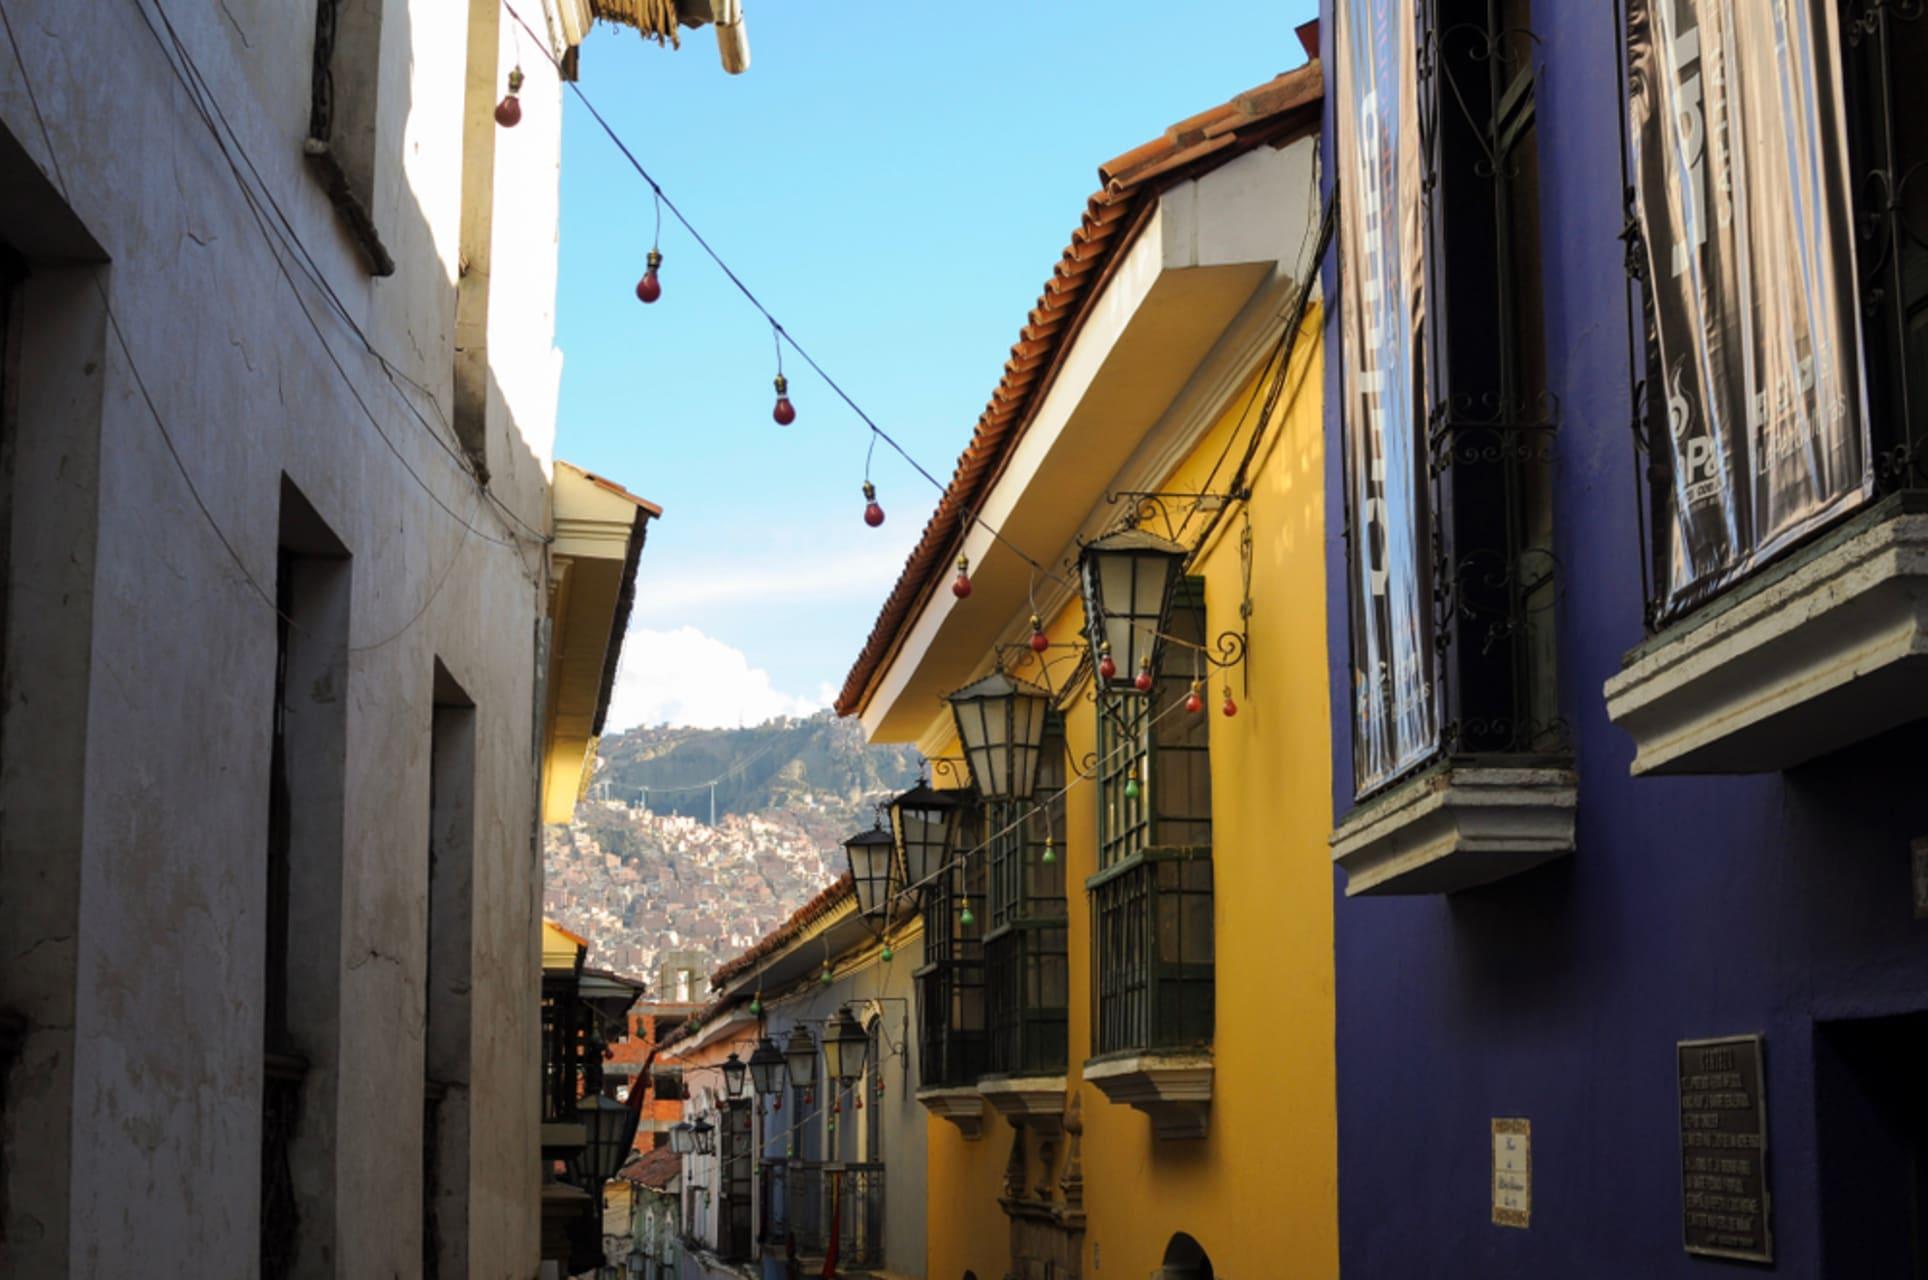 La Paz - Jaen: most colonial street